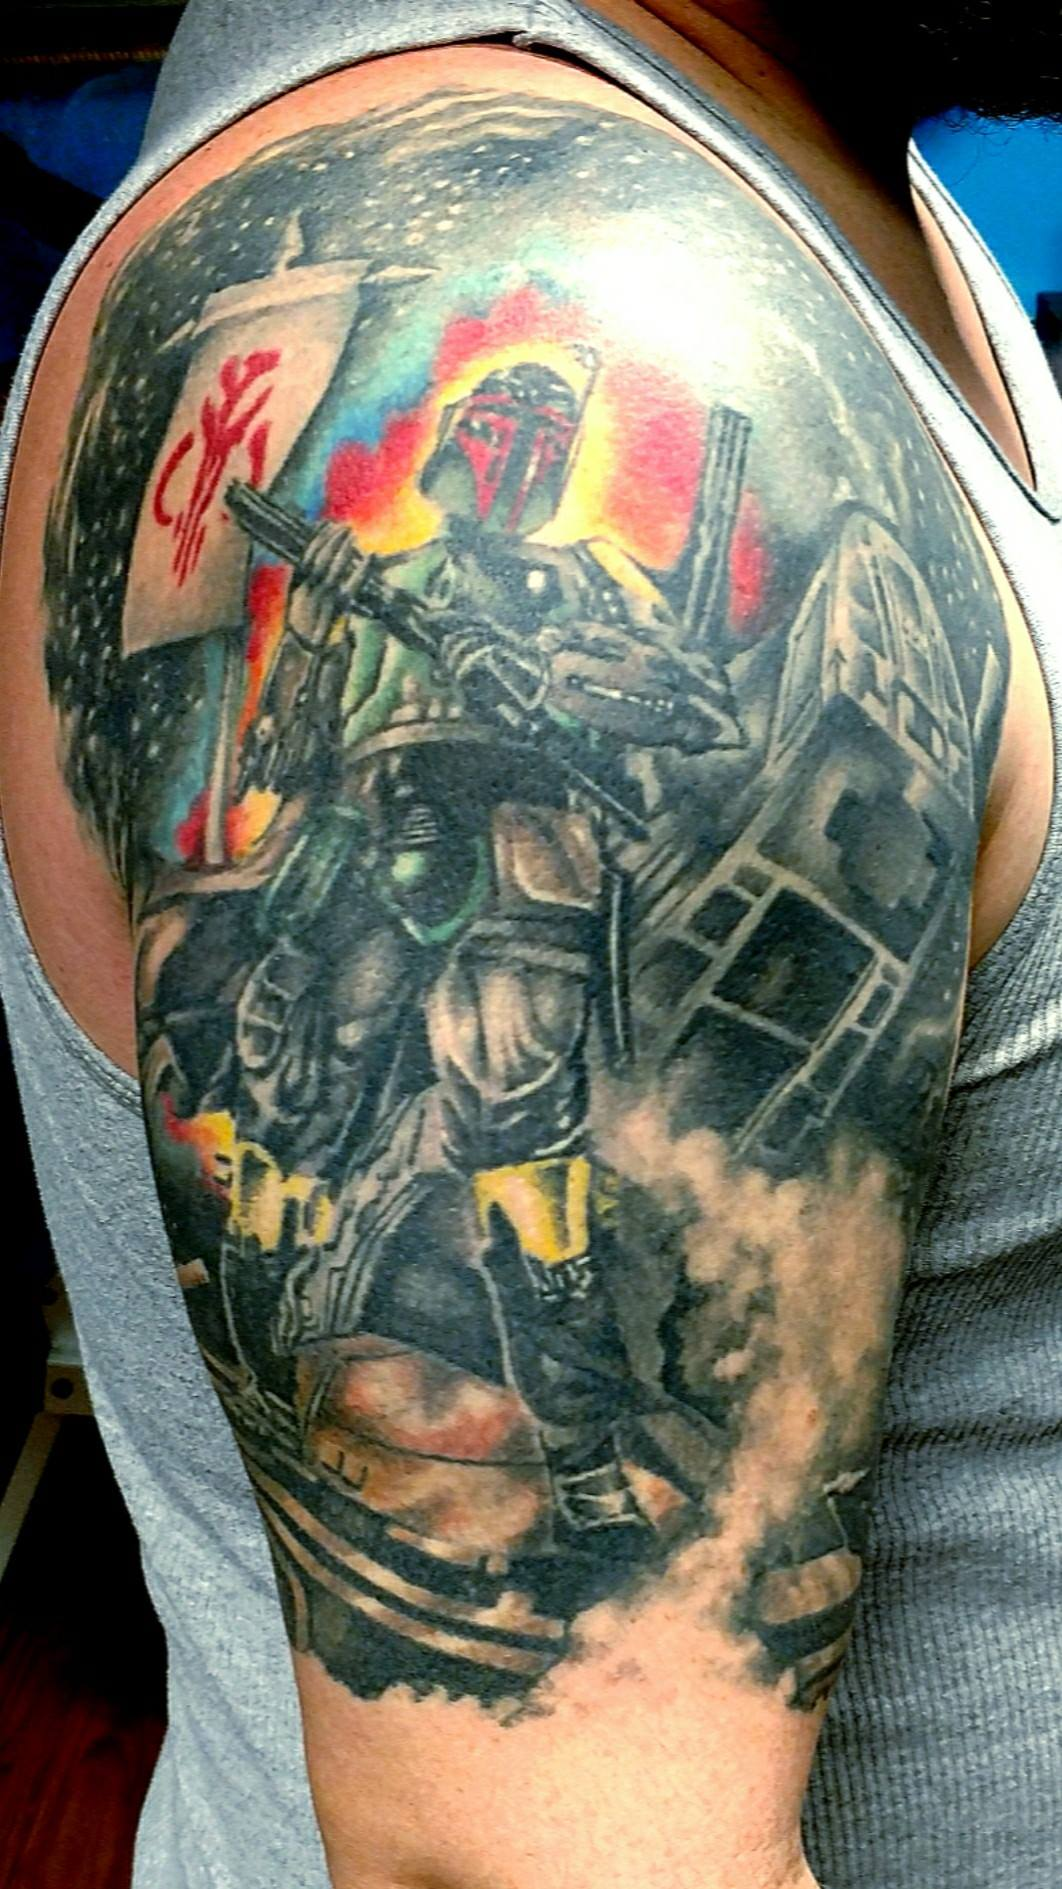 Headless hands custom tattoo shop kansas city tattoos for Tattoo parlors in kansas city